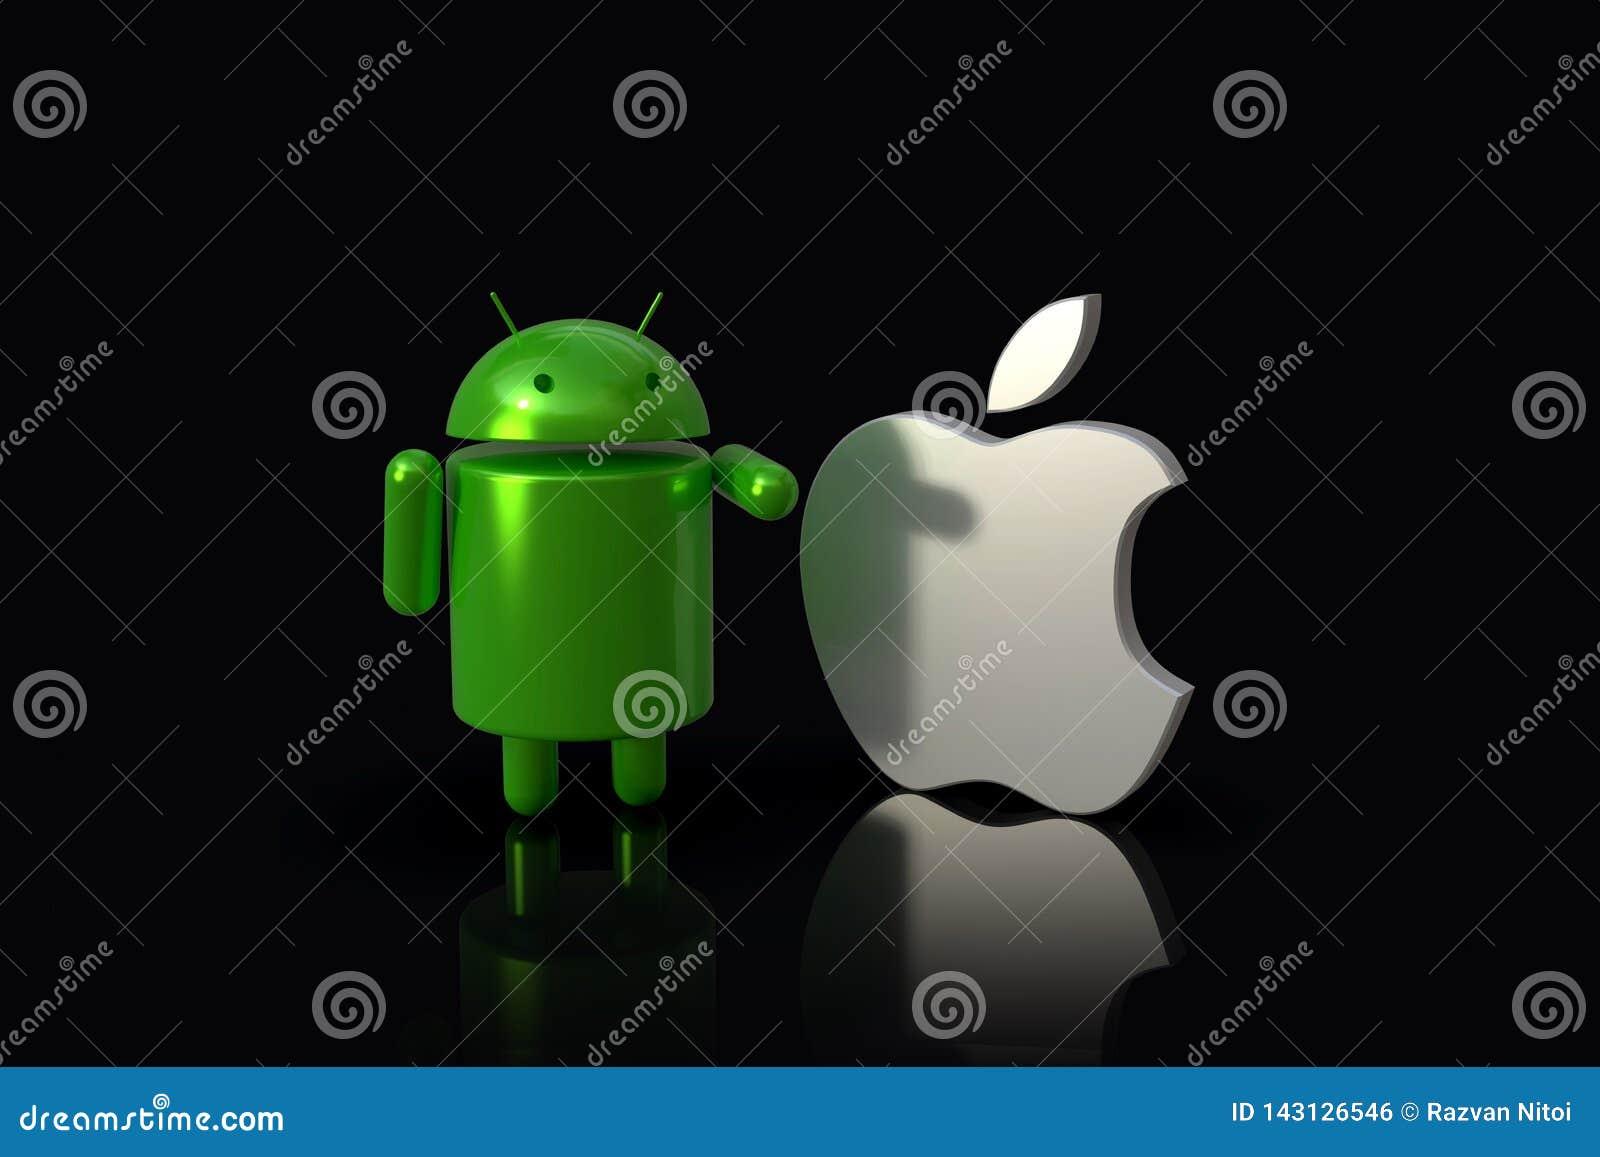 Android contra IOS de Apple - caracteres del logotipo 3D, de lado a lado